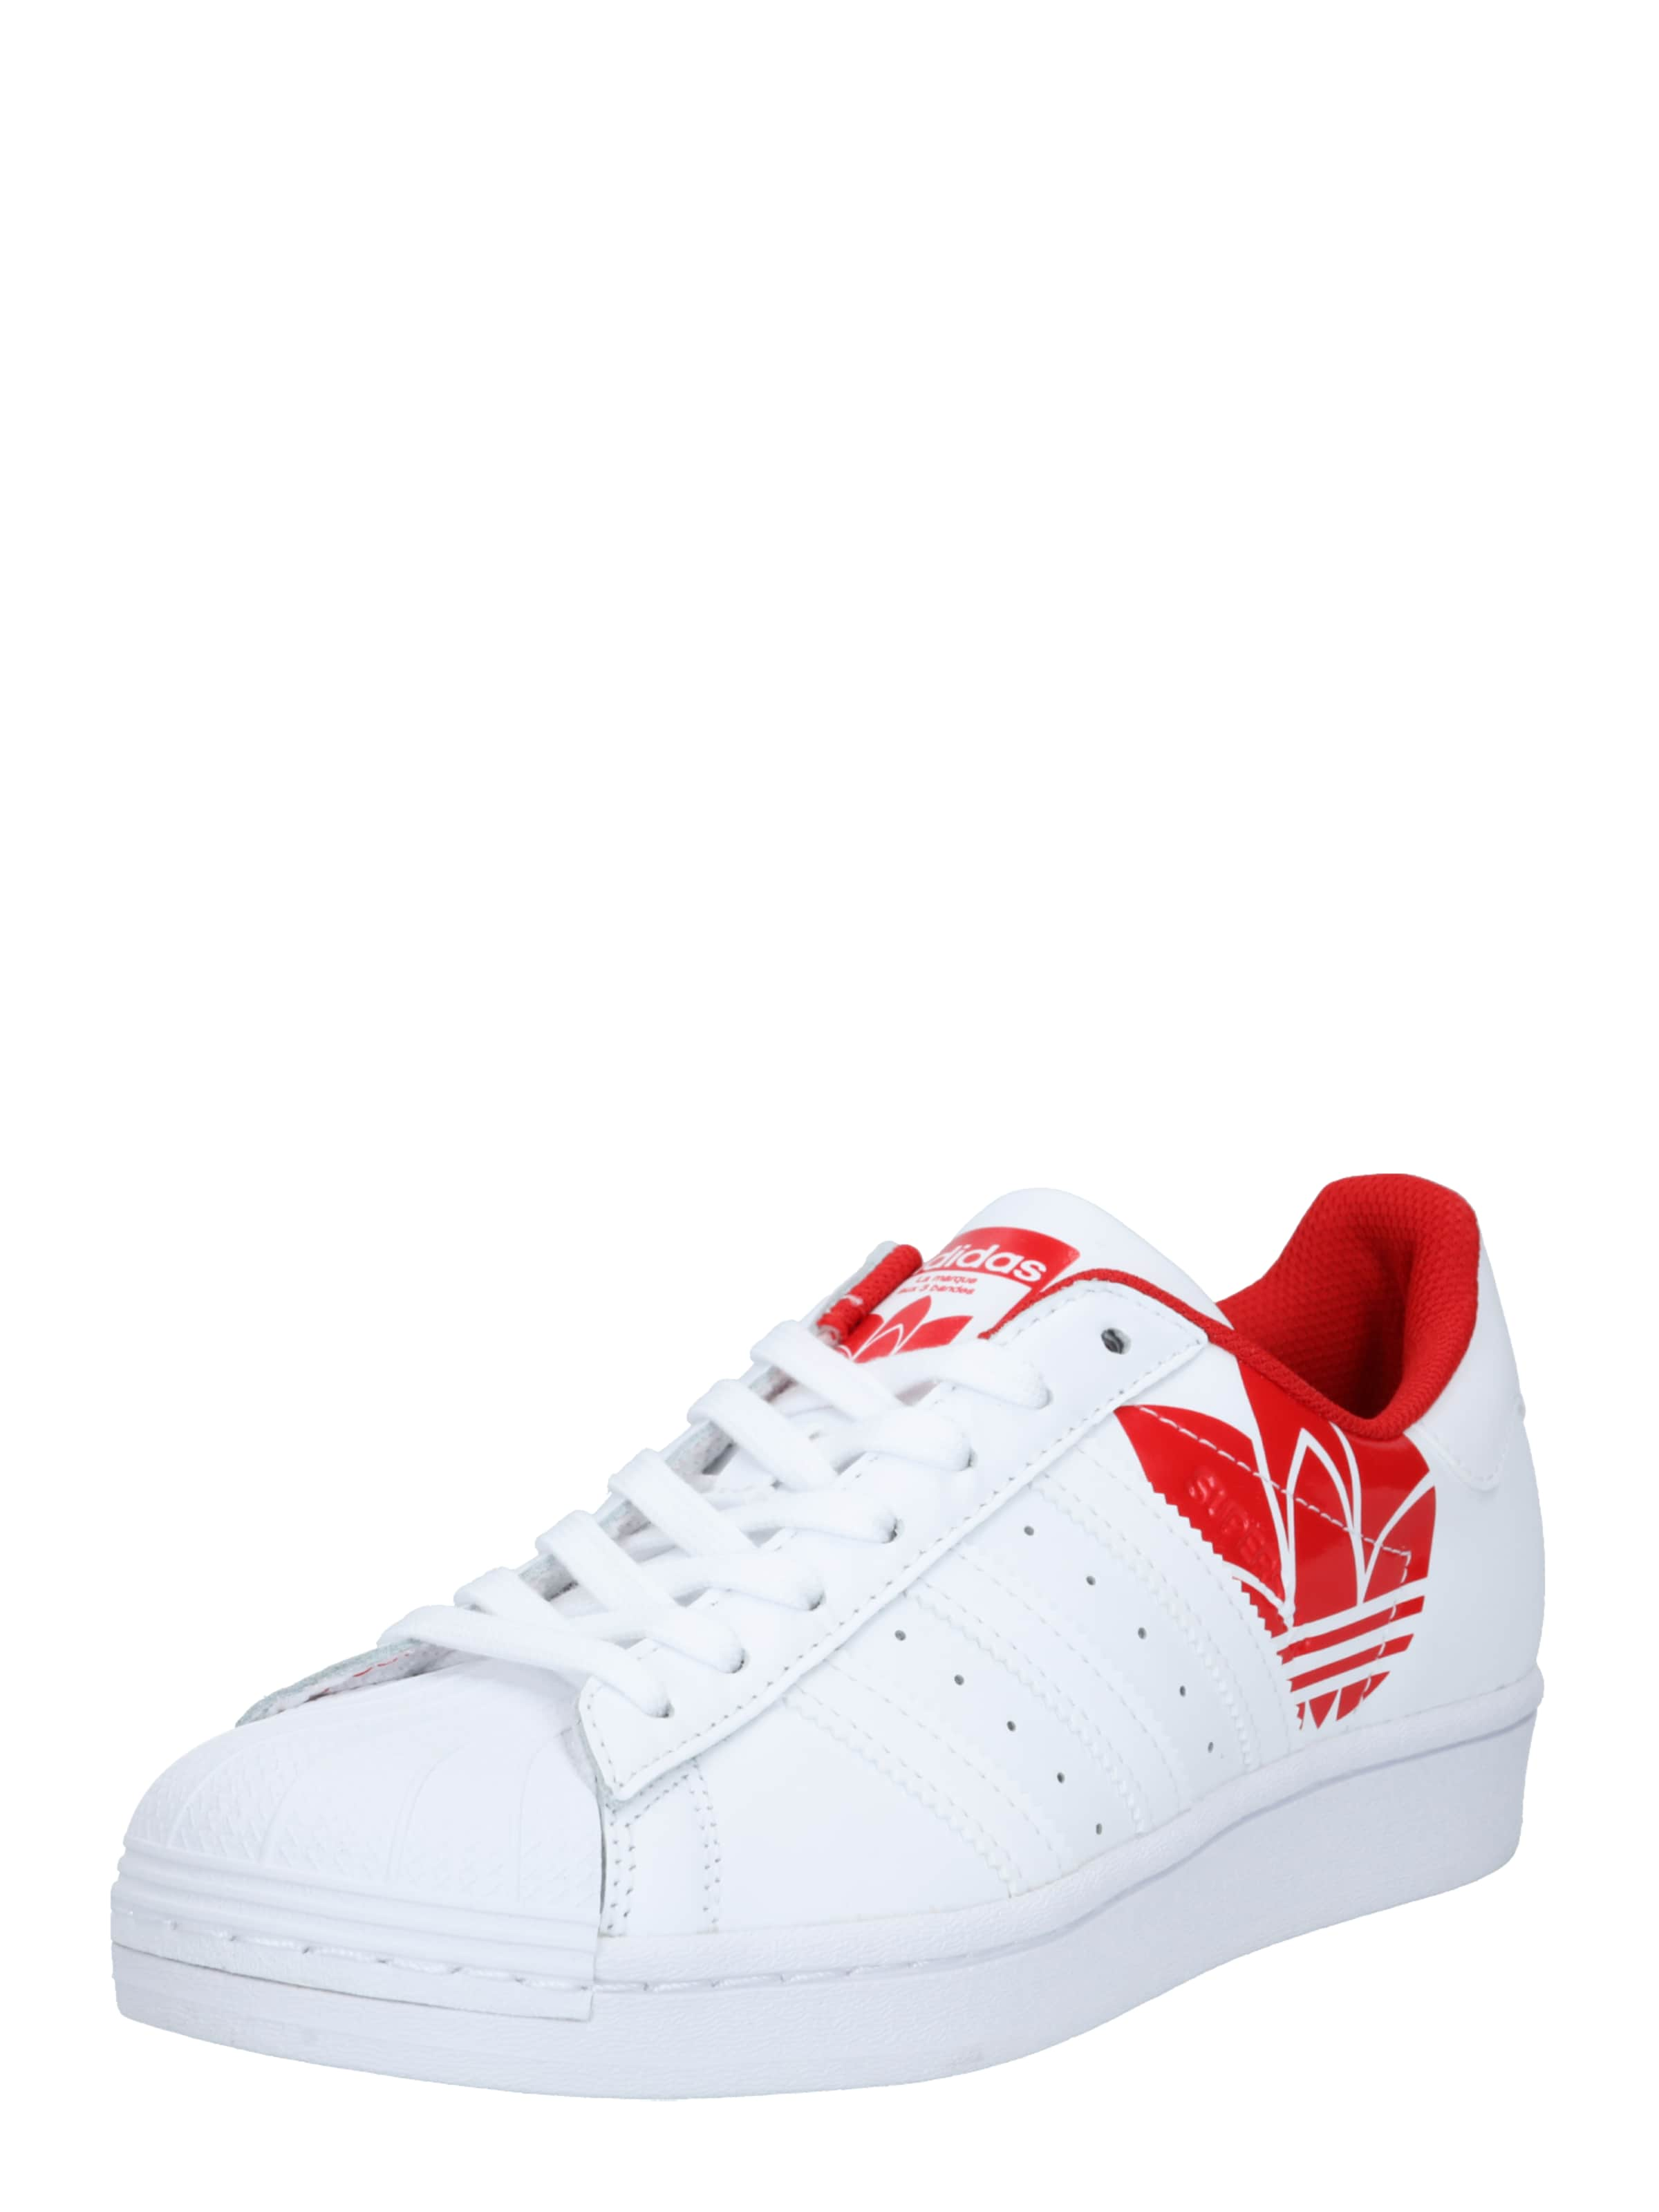 ADIDAS ORIGINALS Låg sneaker 'SUPERSTAR' i röd / vit